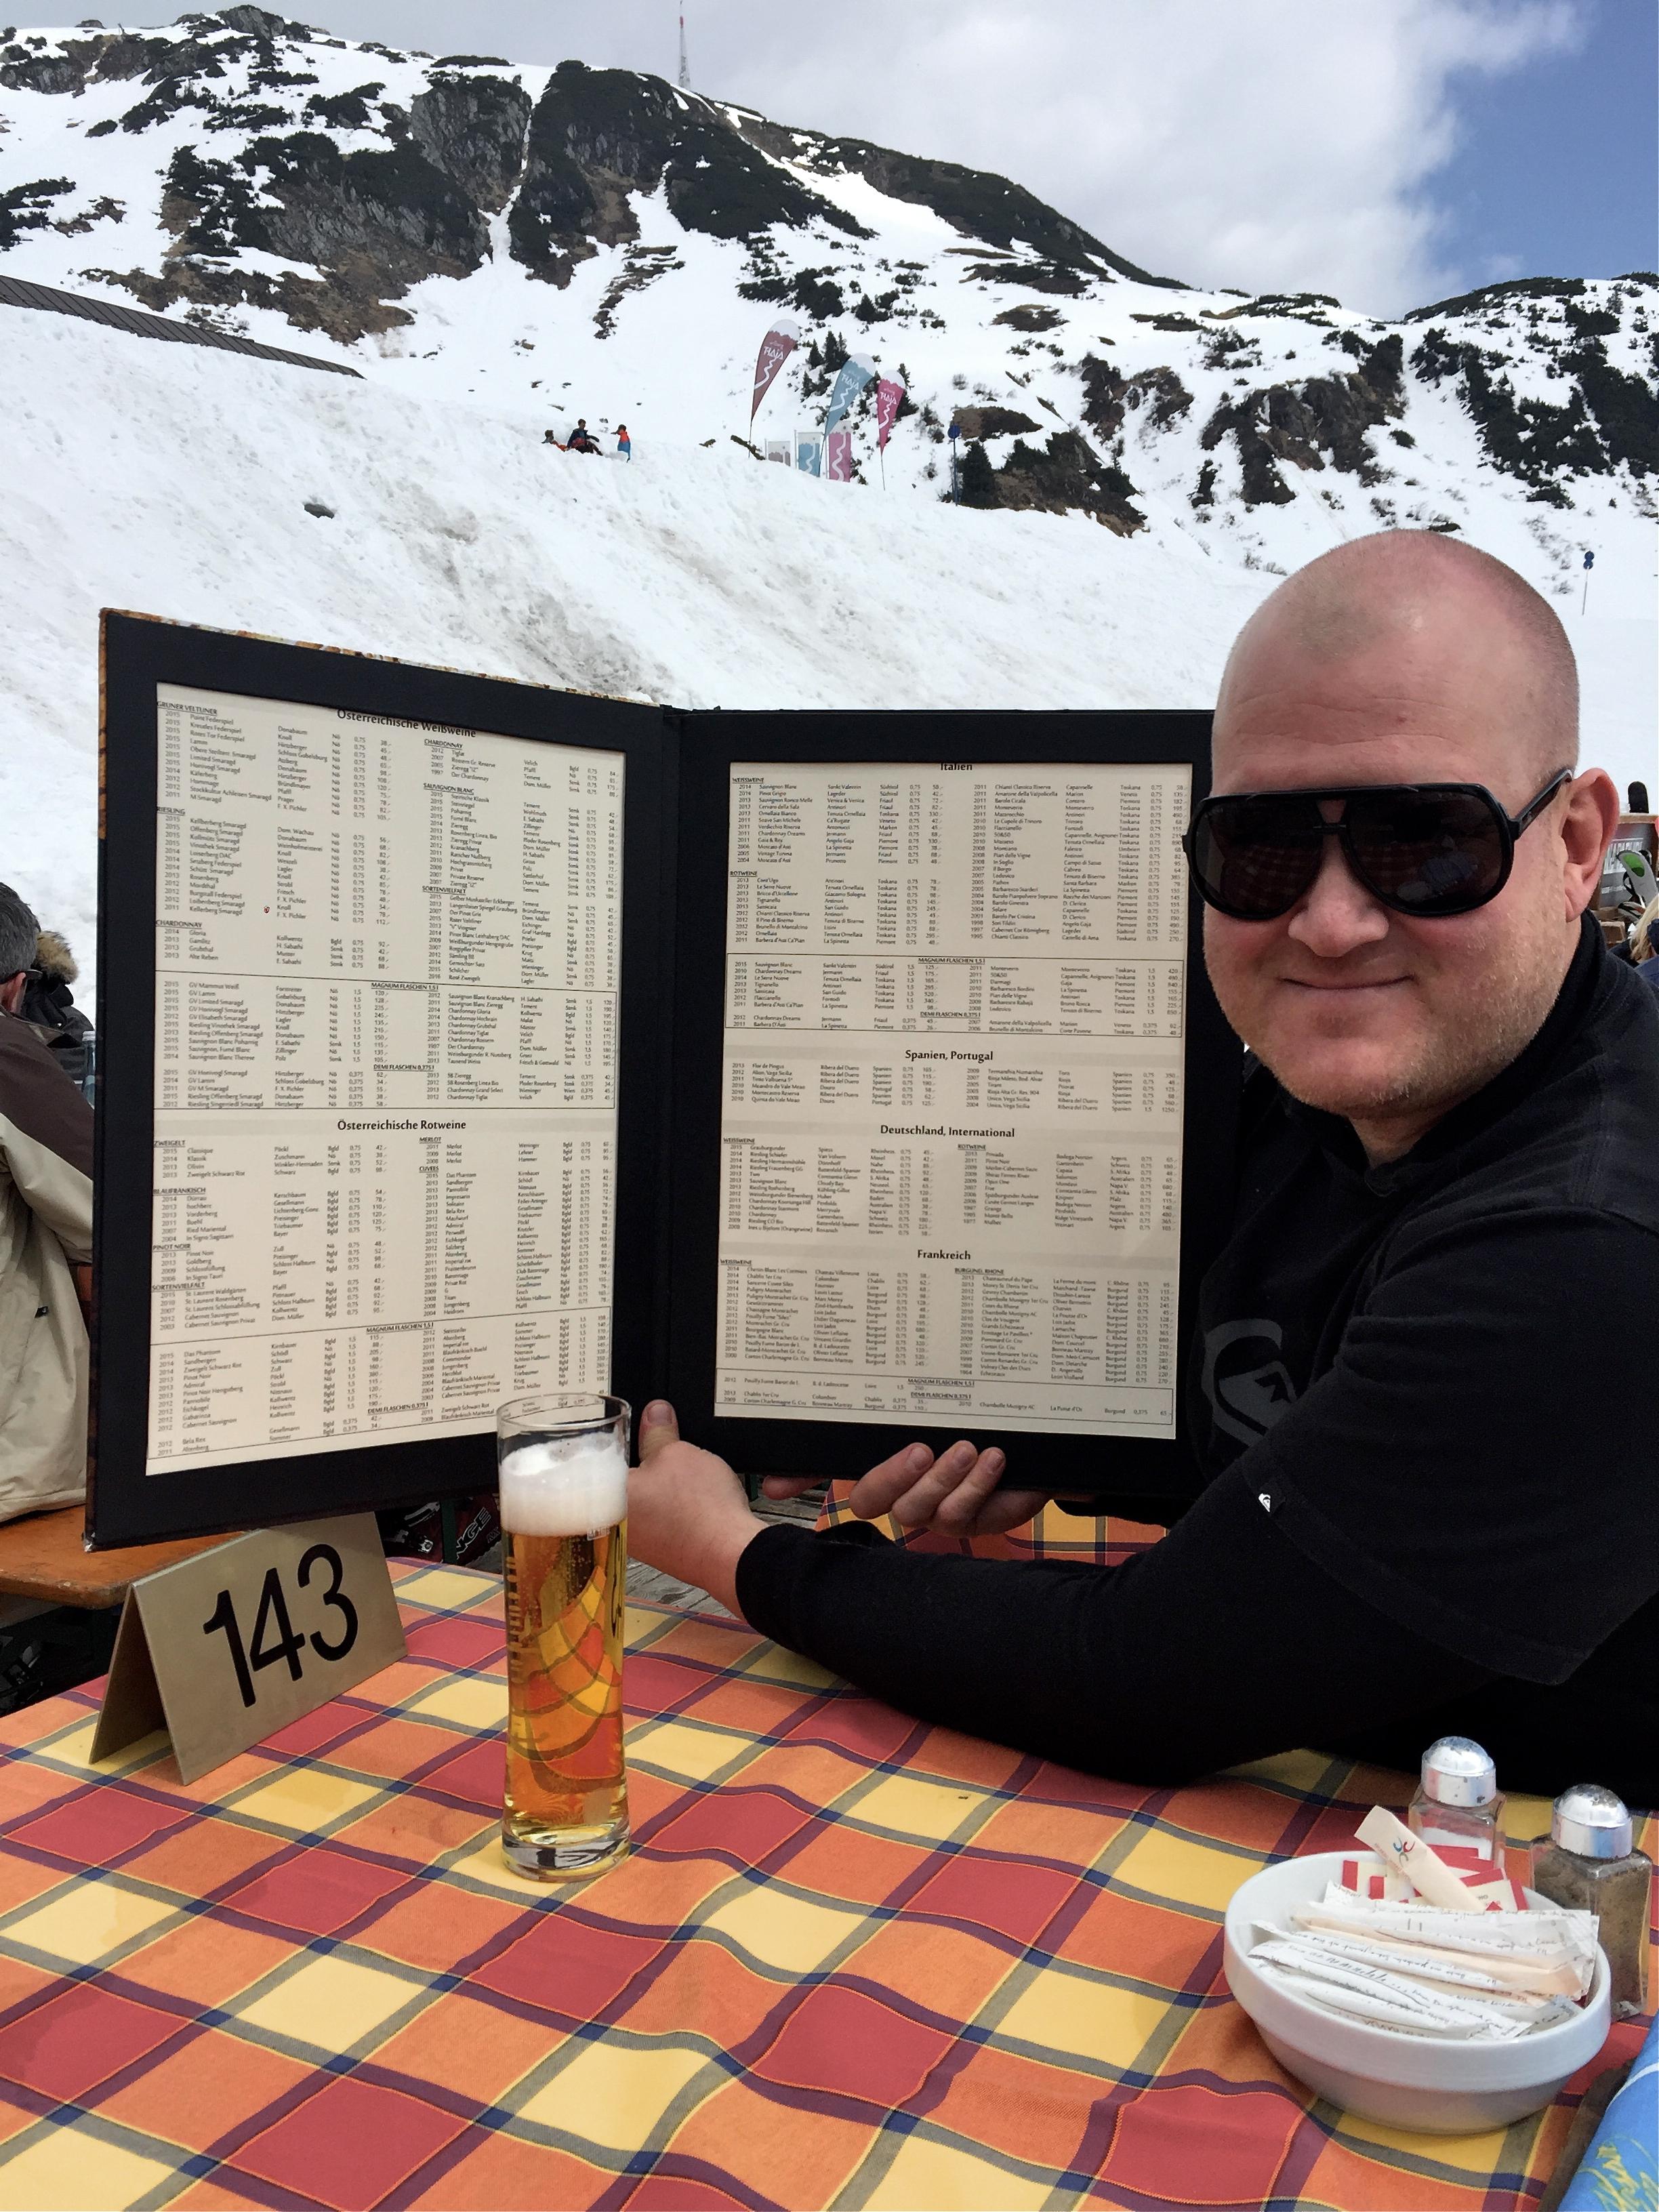 Dennis with the wine list at Hospiz Alm, St. Christof, Austria.